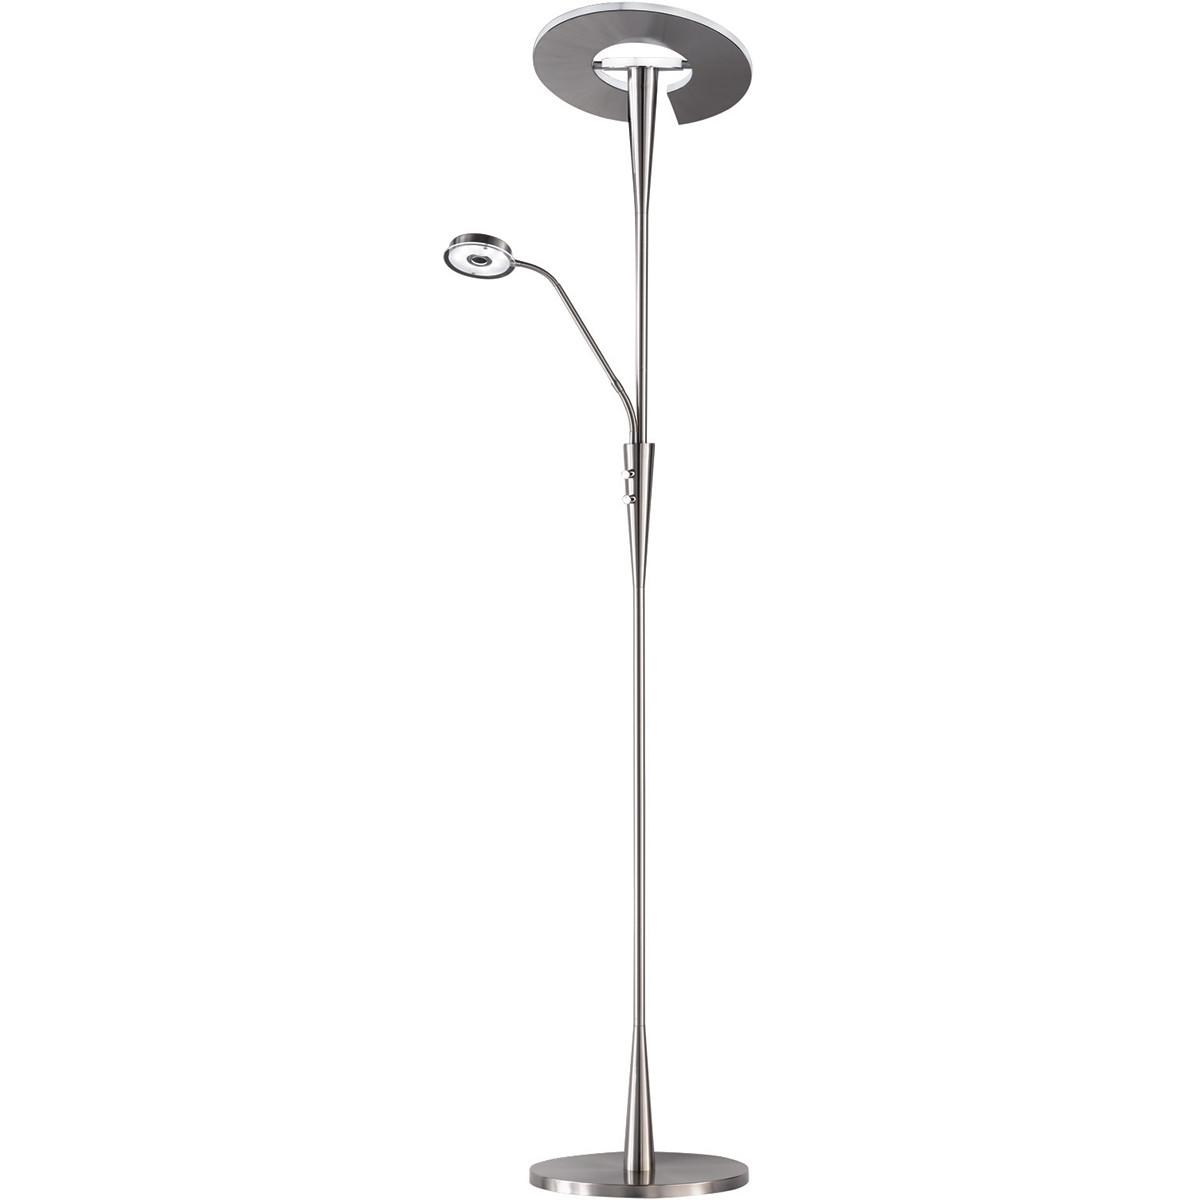 LED Vloerlamp - Trion Qubico - 34W + 5W - Aanpasbare Kleur - 2-lichts - Dimbaar - Rond - Mat Goud -